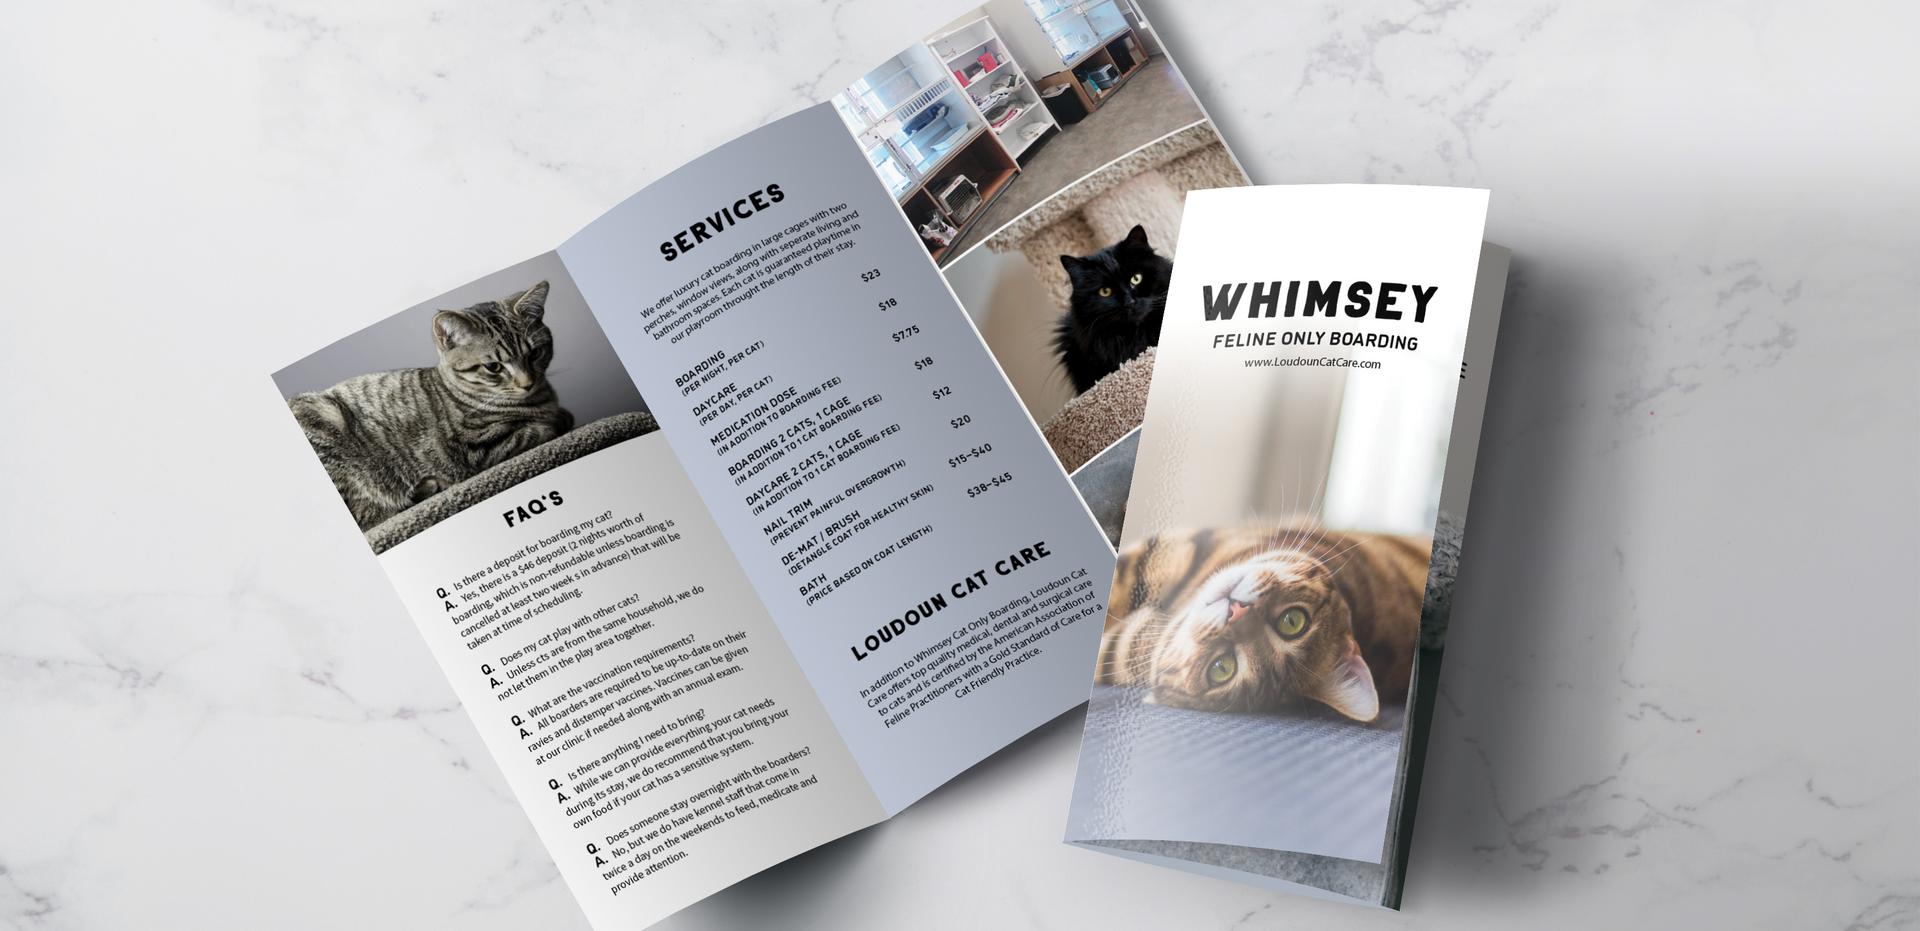 Whimsey Feline Only Boarding Brochure by Kaitlynn Stone